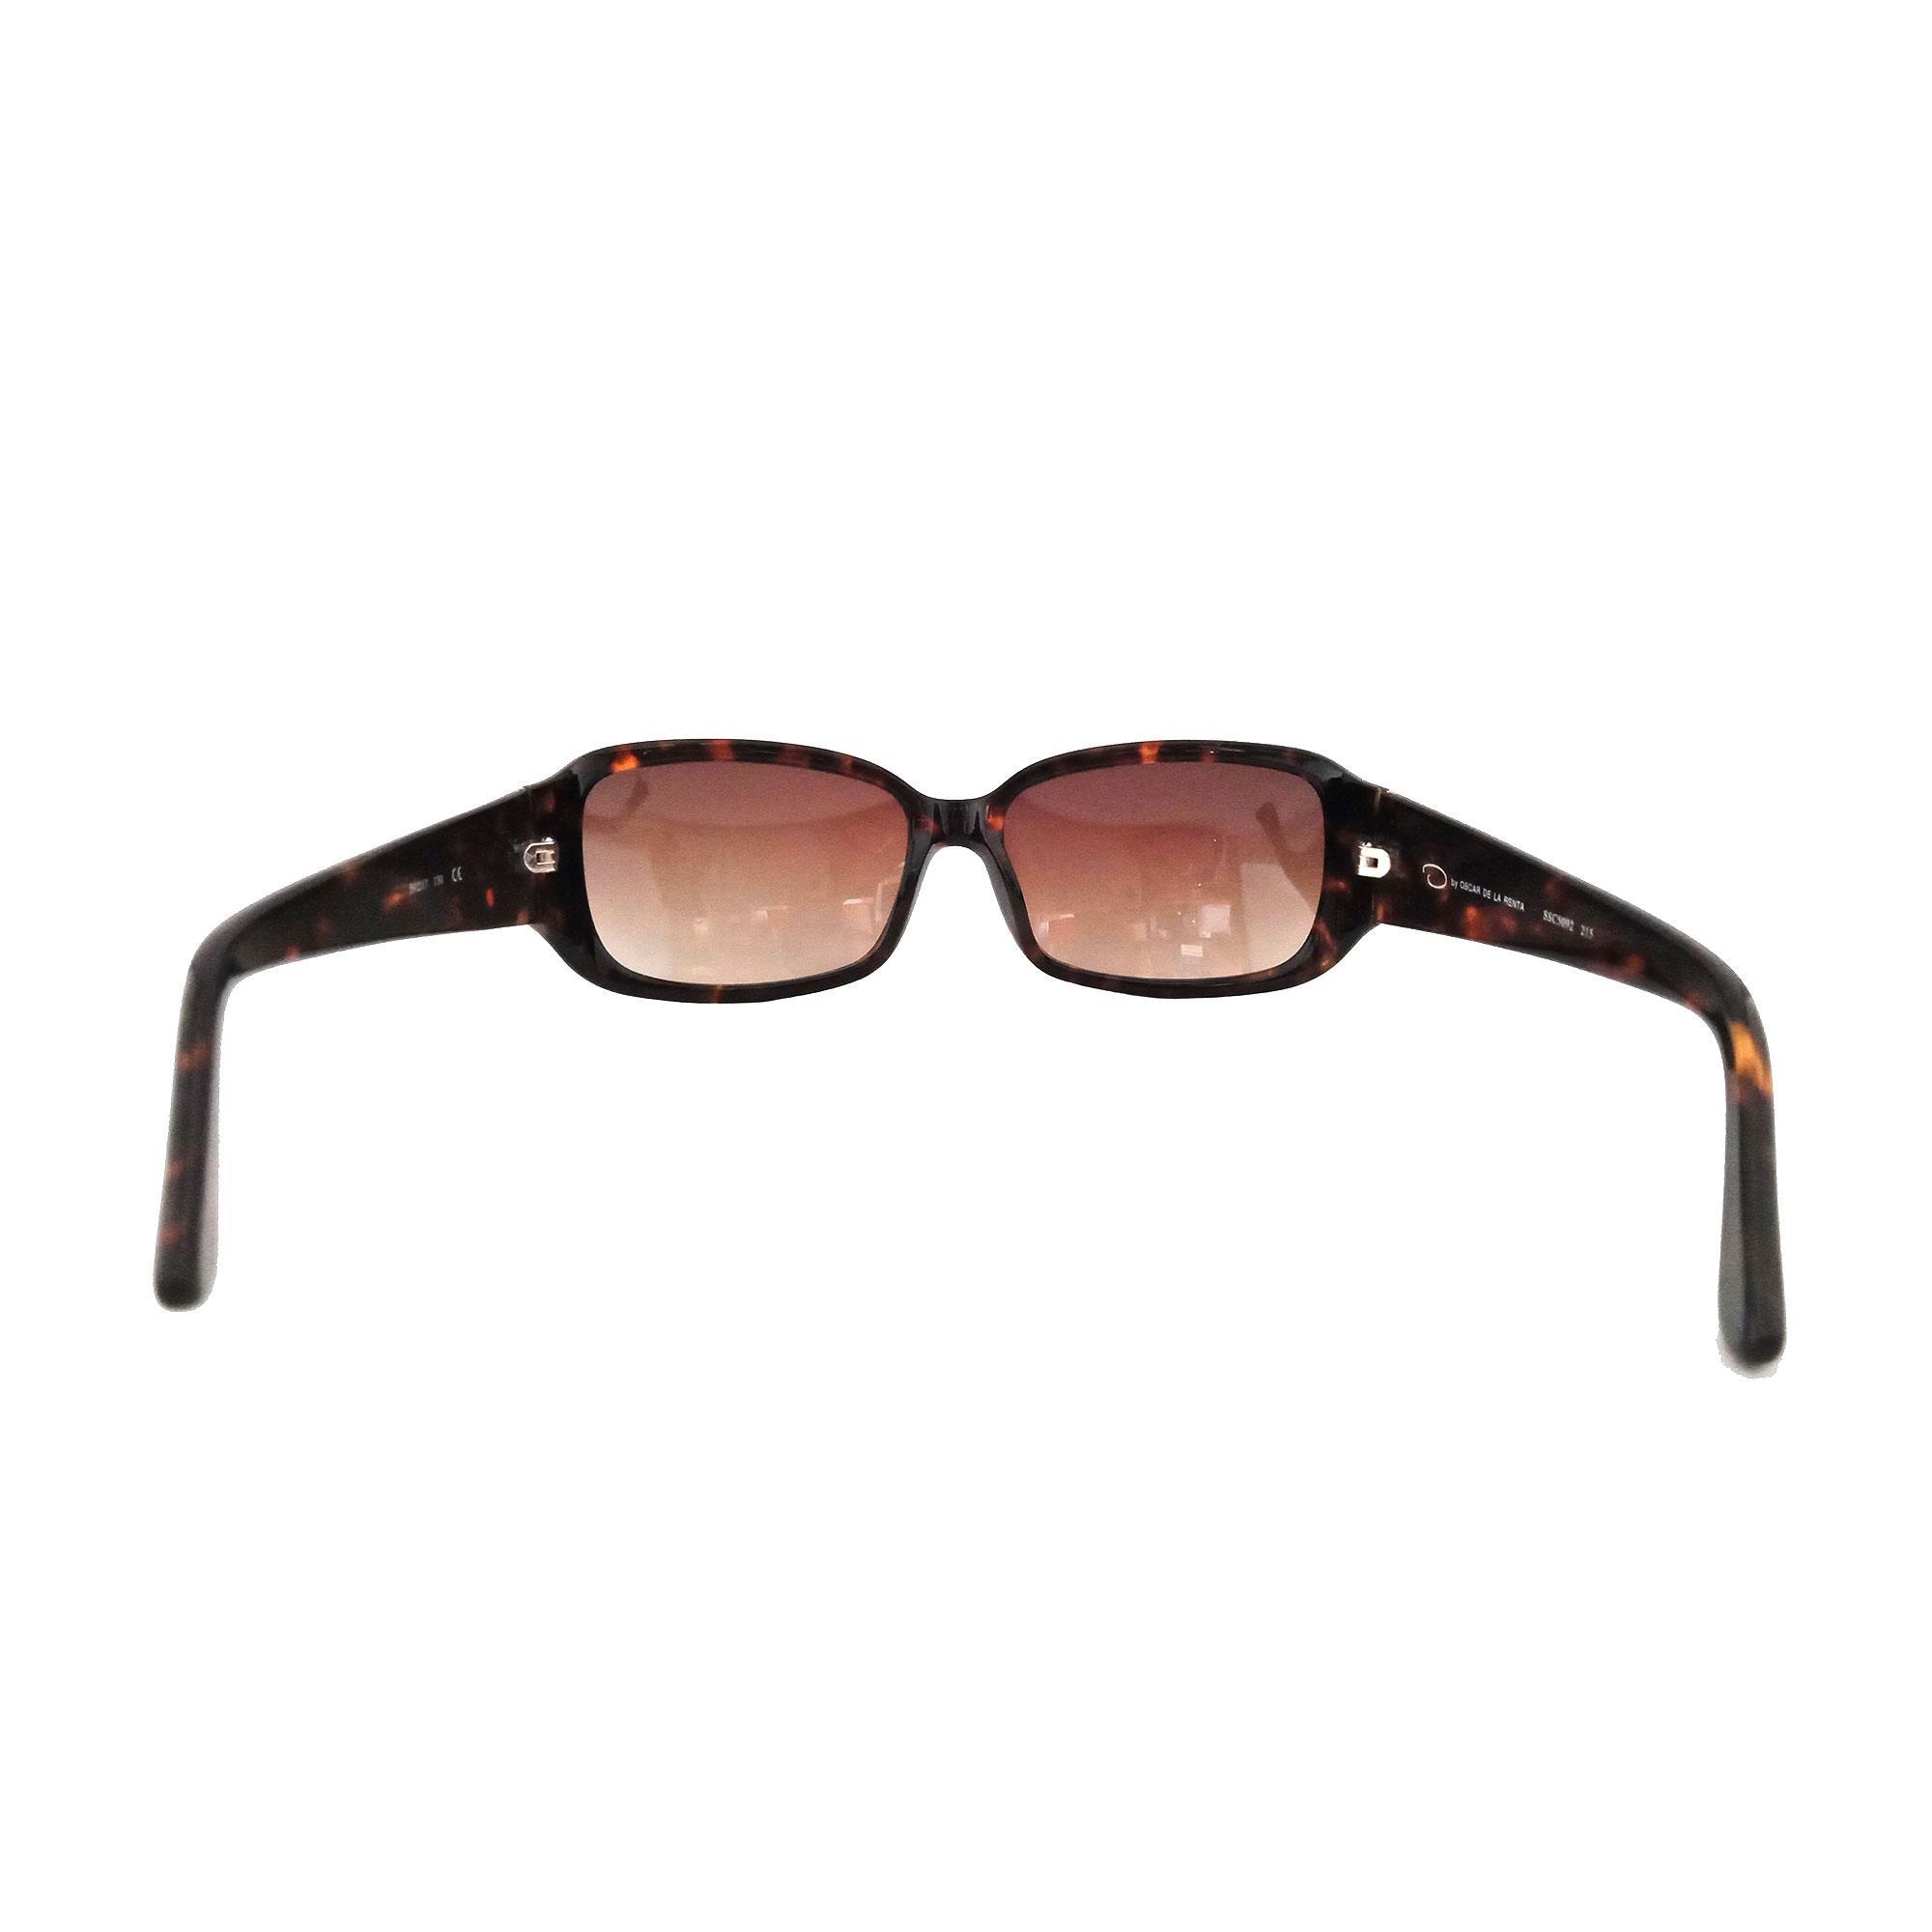 397523180877 Oscar De La Renta Eyewear Women's Rectangular Sunglasses (Burgundy)